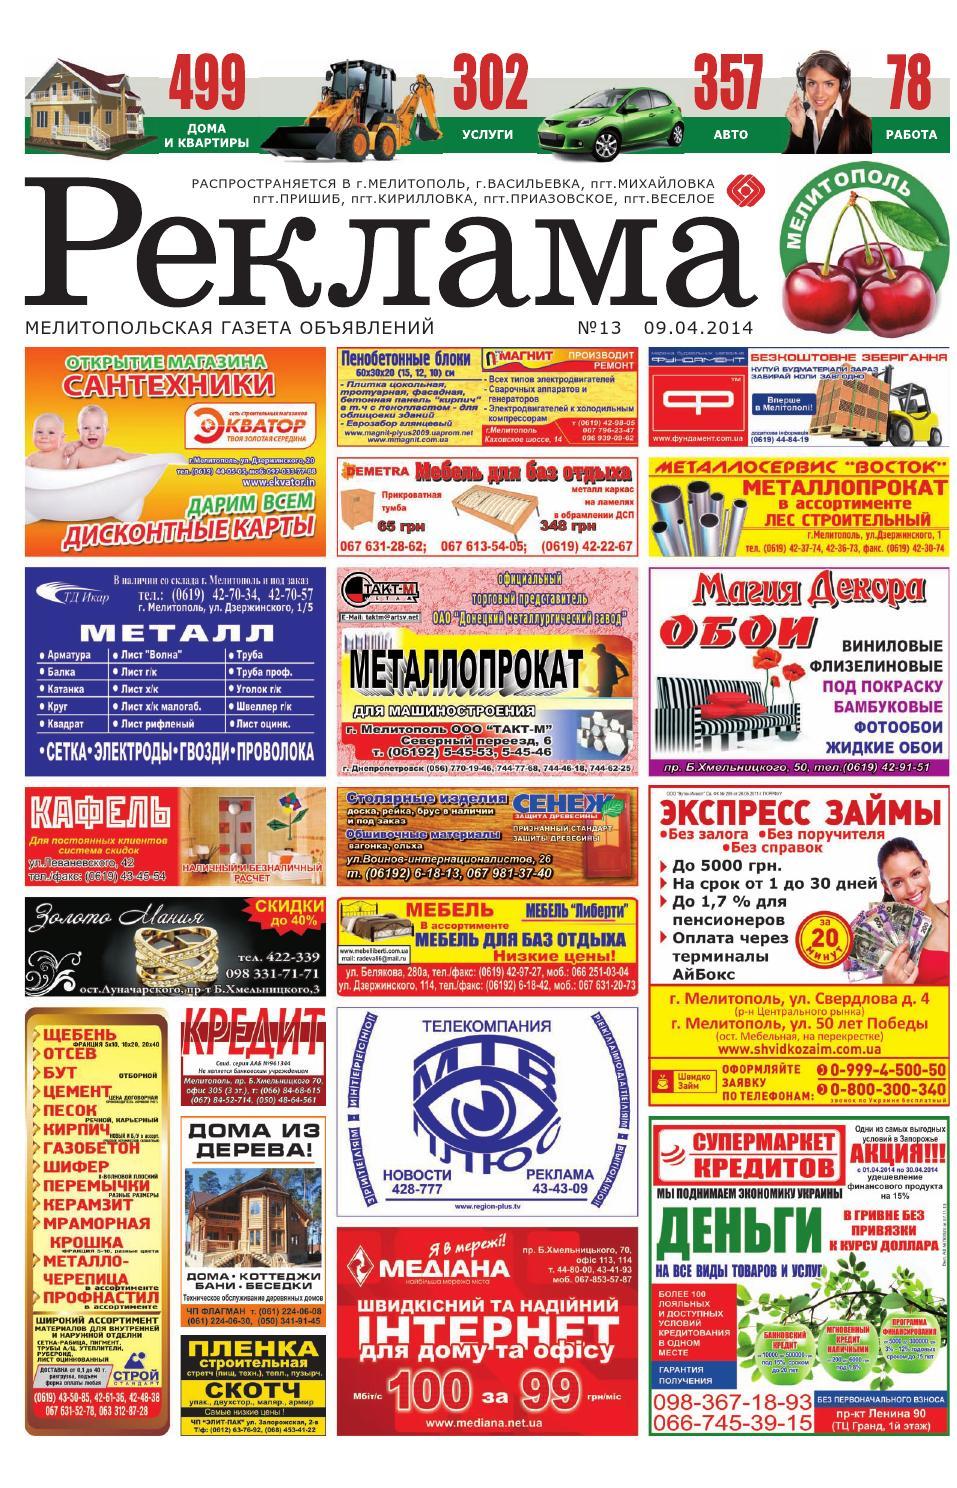 Reklama 13 09 04 2014 by Юрий Бобков - issuu 0f2b04b95da